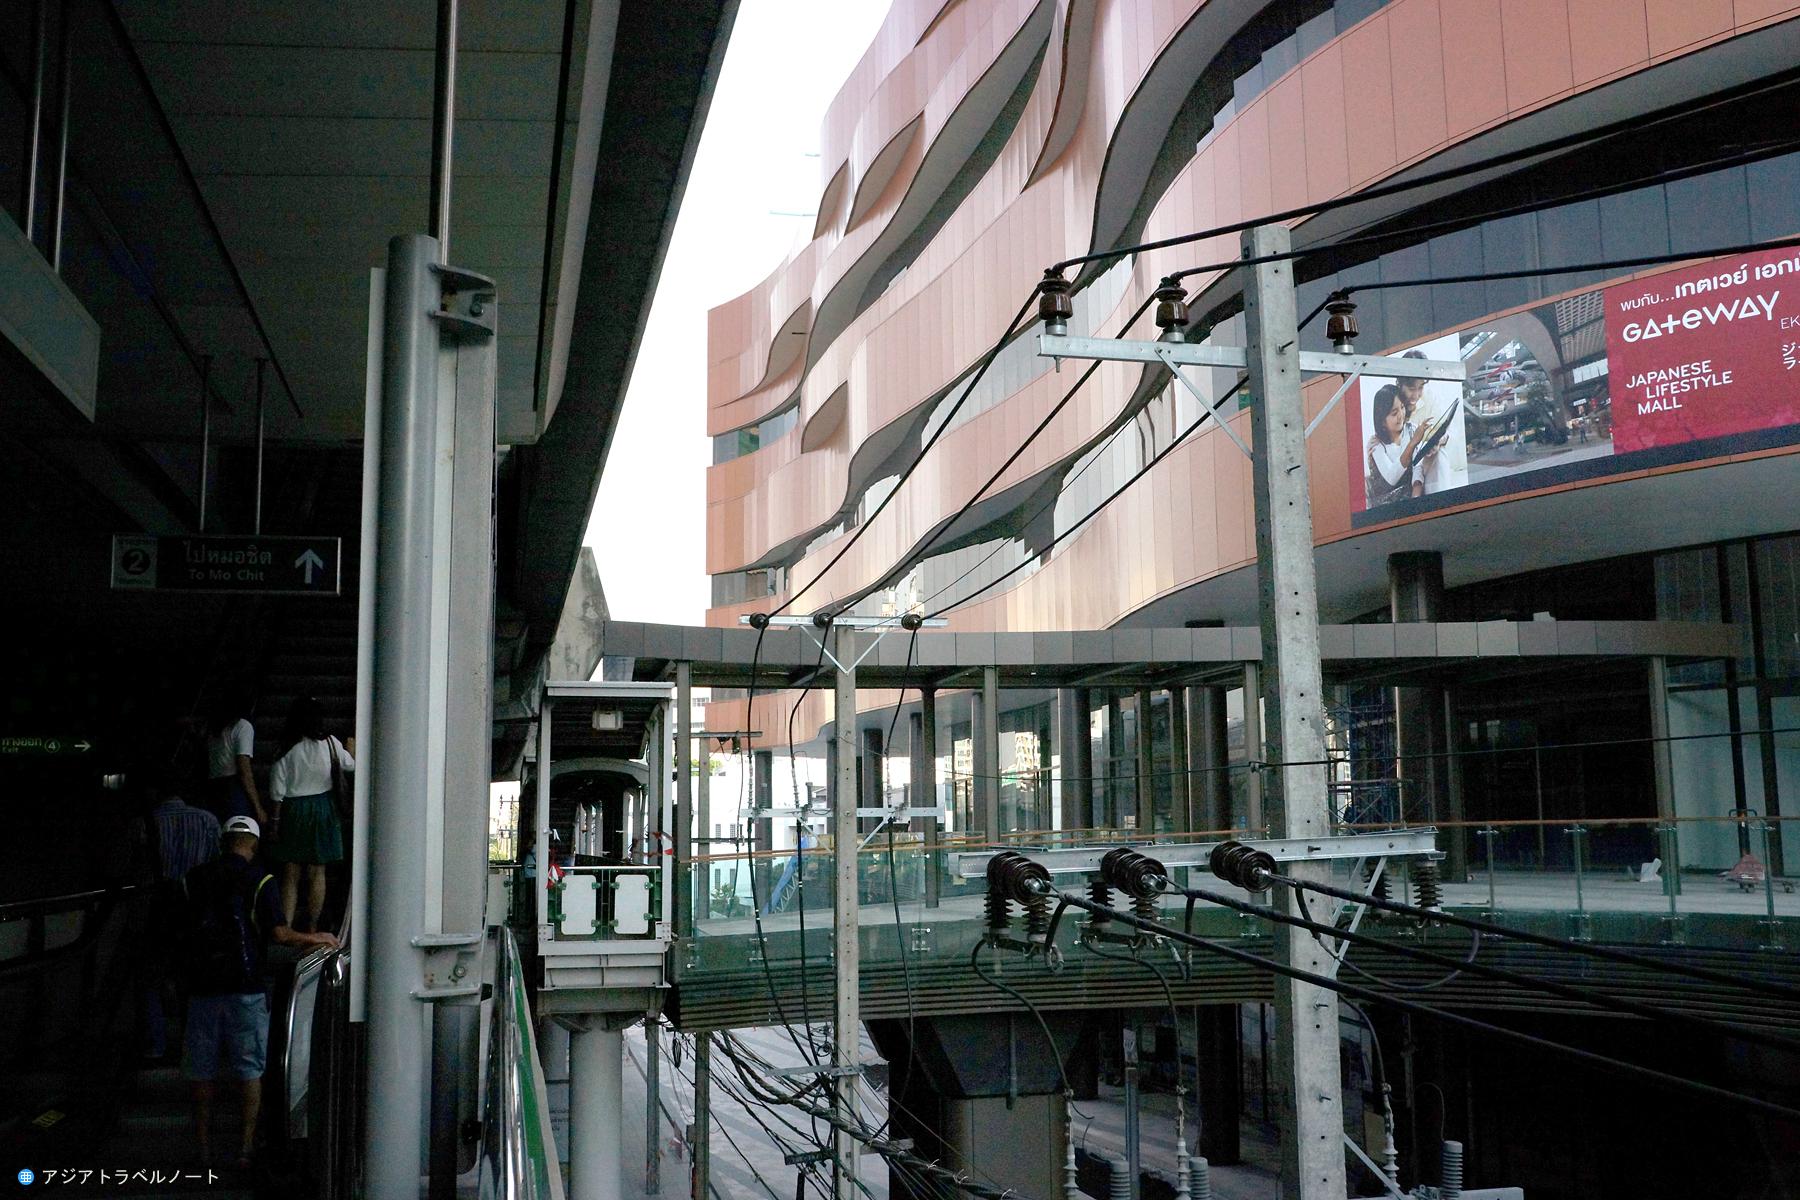 BTSエカマイ駅と直結されているゲートウェイ・エカマイ